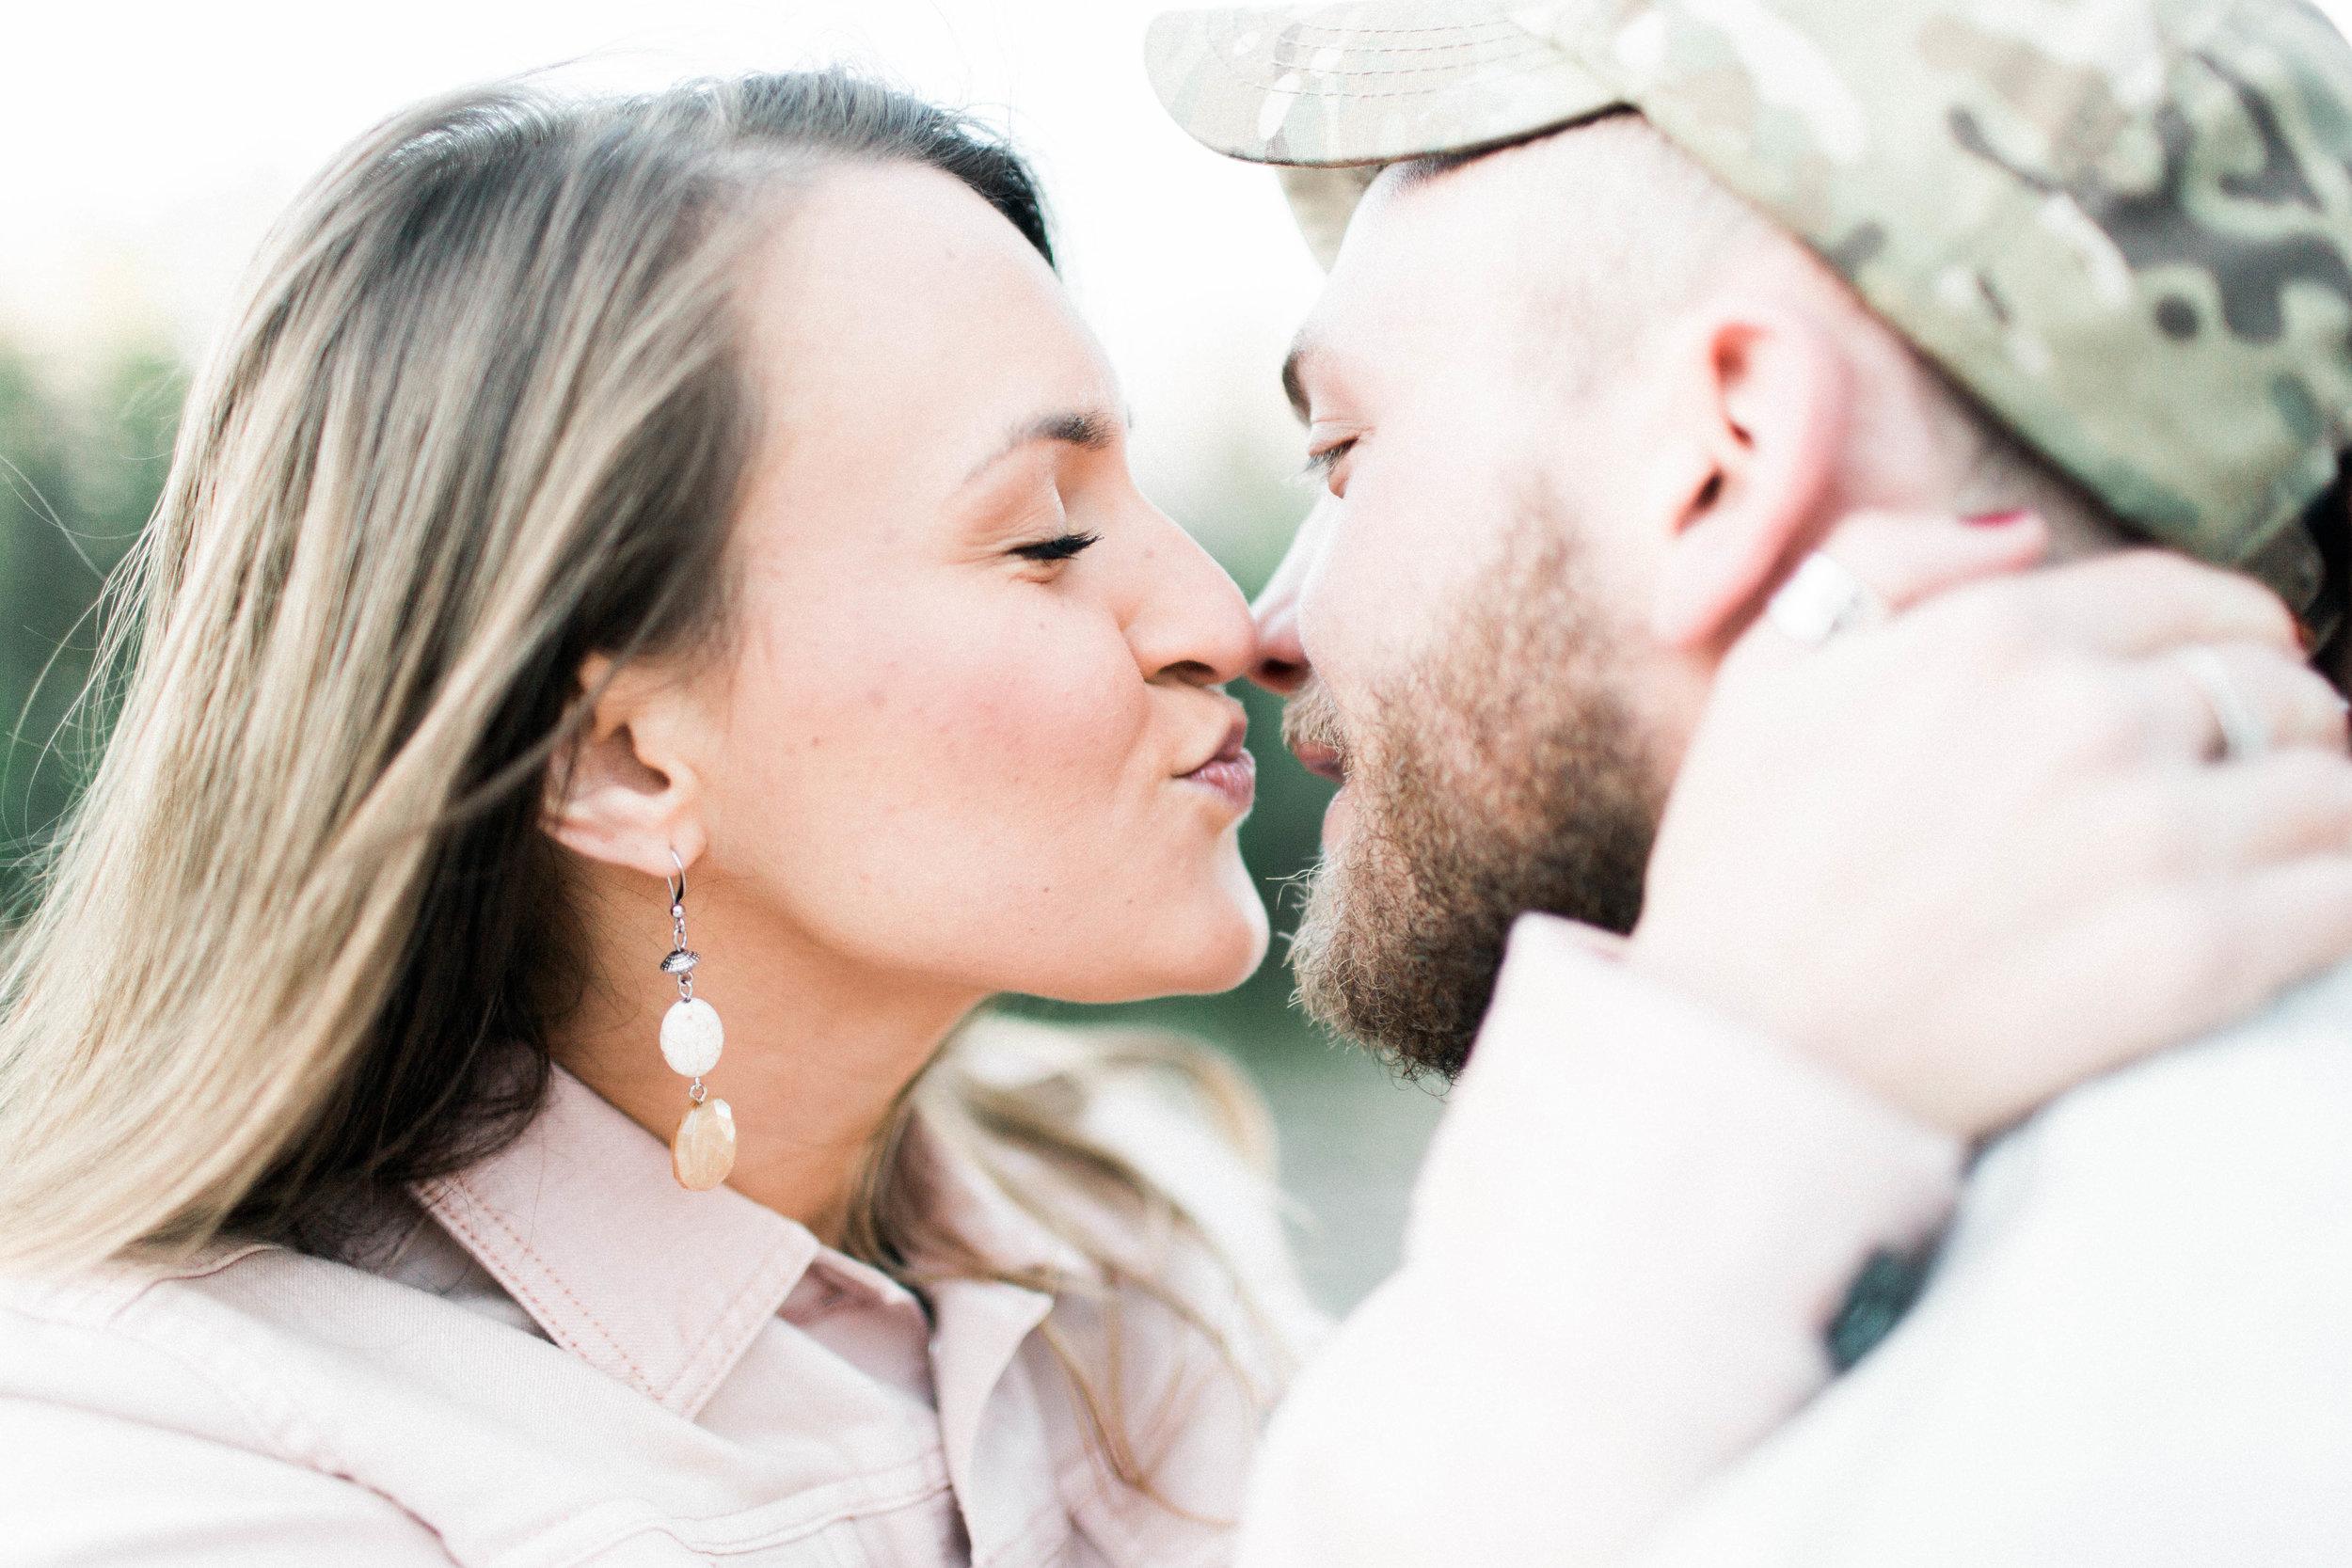 Horse Farm Engagment - Sabrina Leigh Studios - Northern Michigan Wedding Photographer 02.jpg